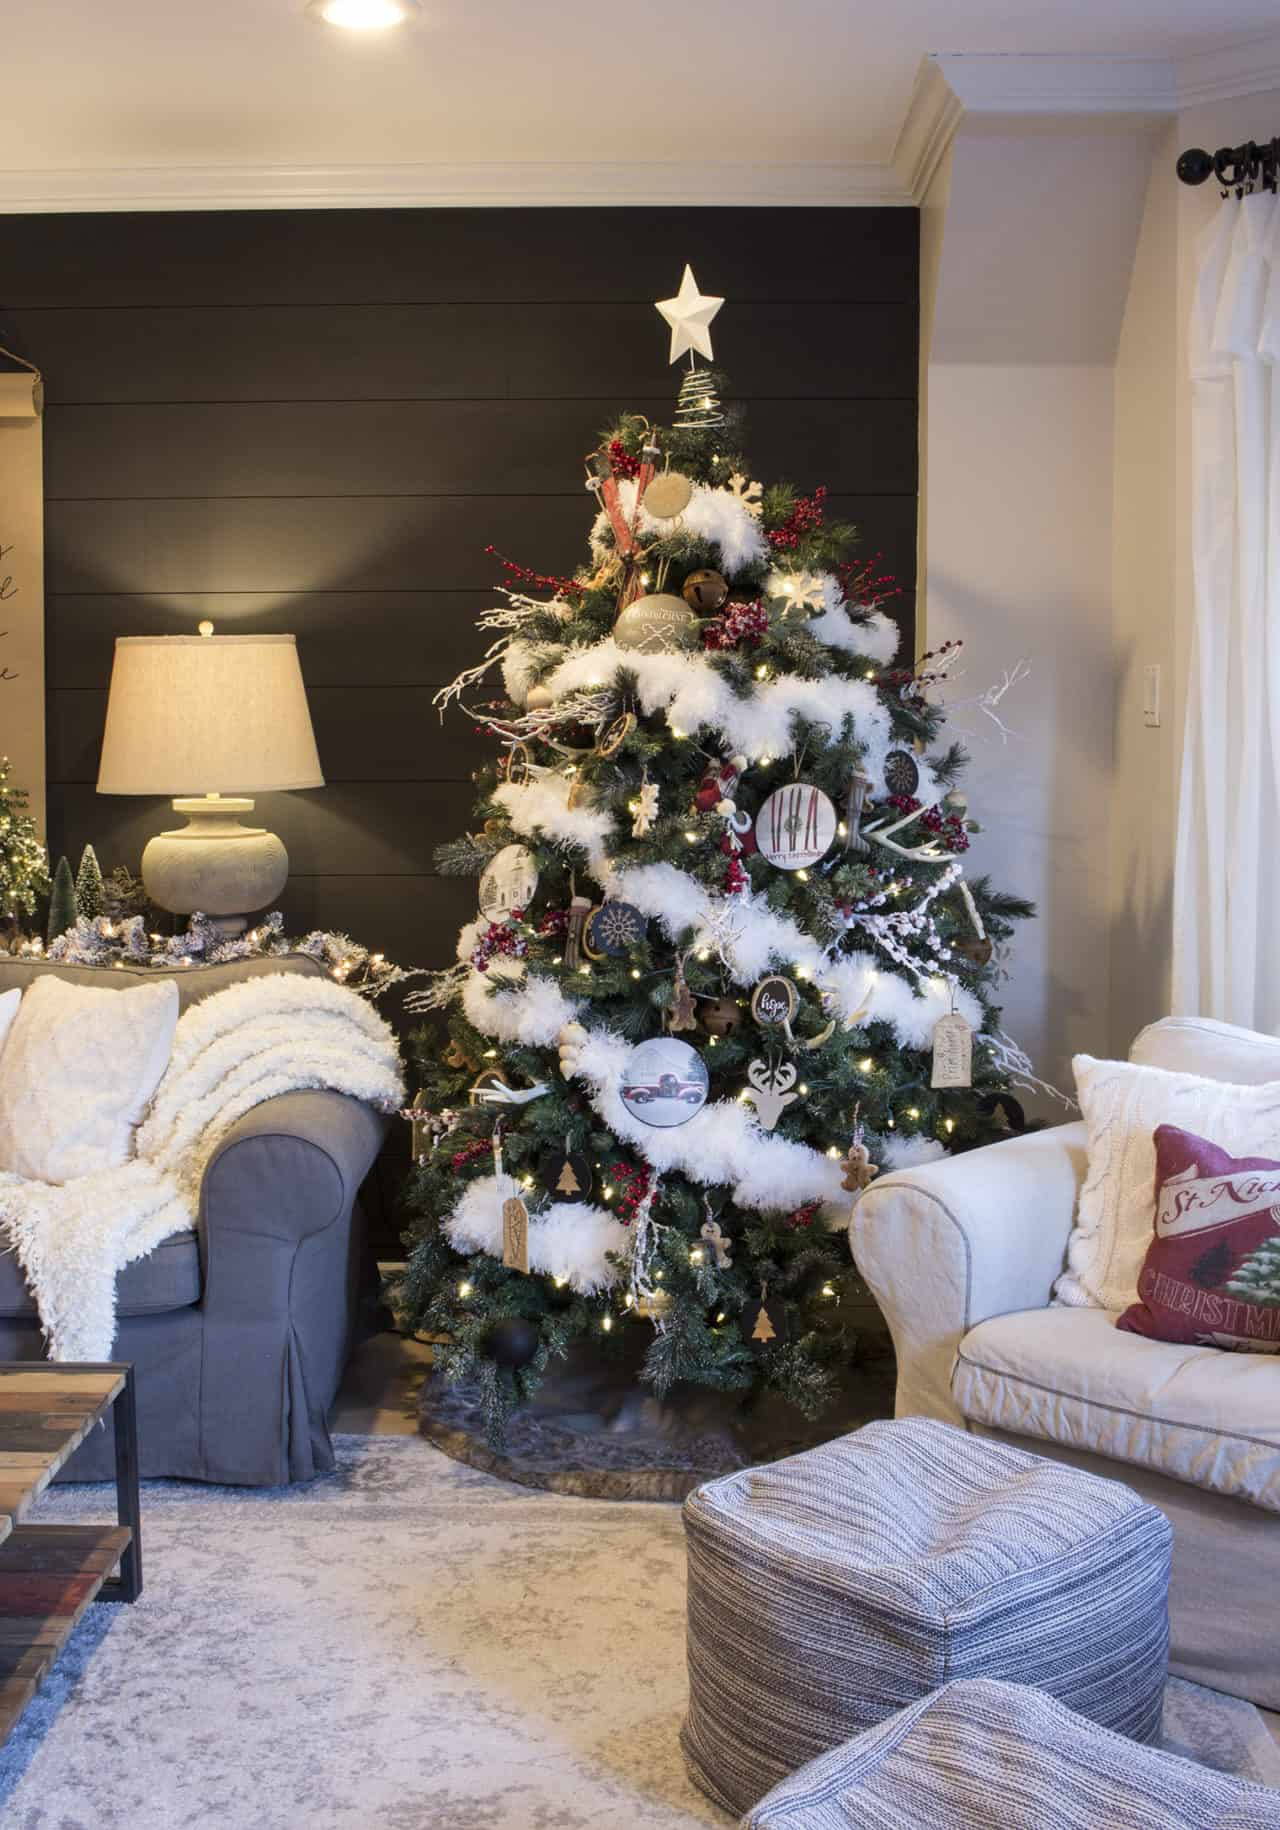 snowy rustic Christmas tree